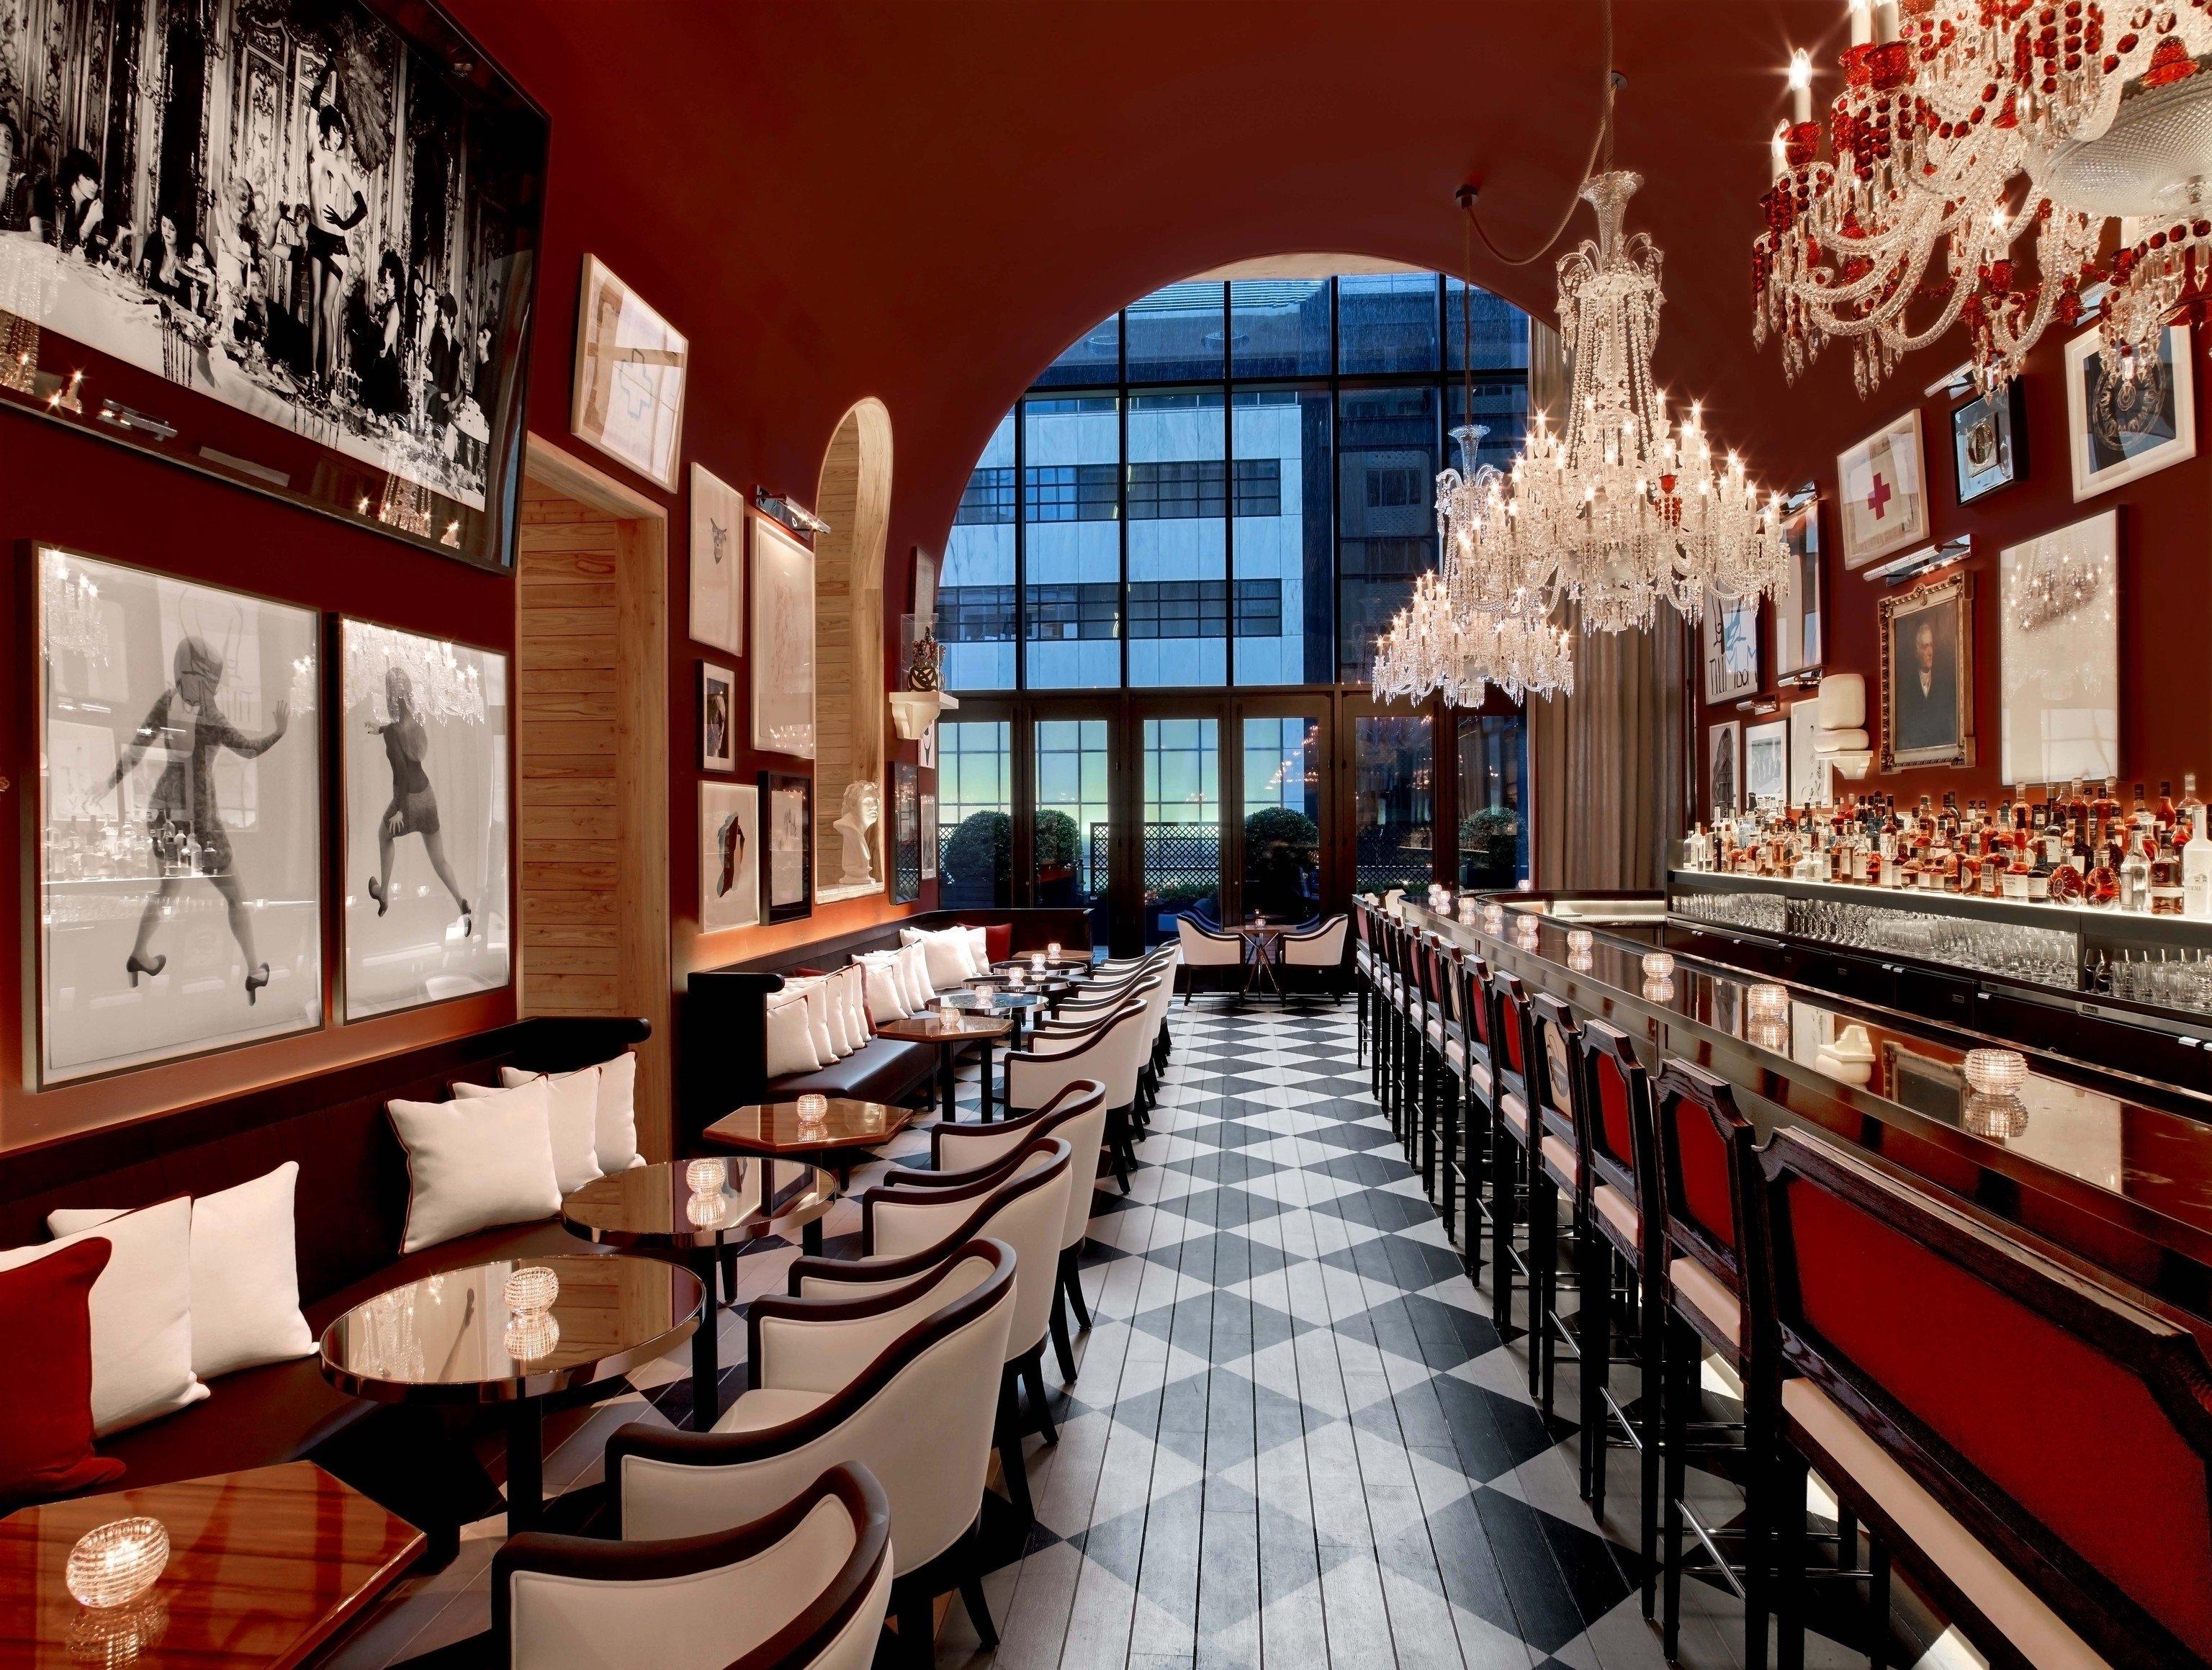 Hotels NYC restaurant meal interior design Bar café dining room